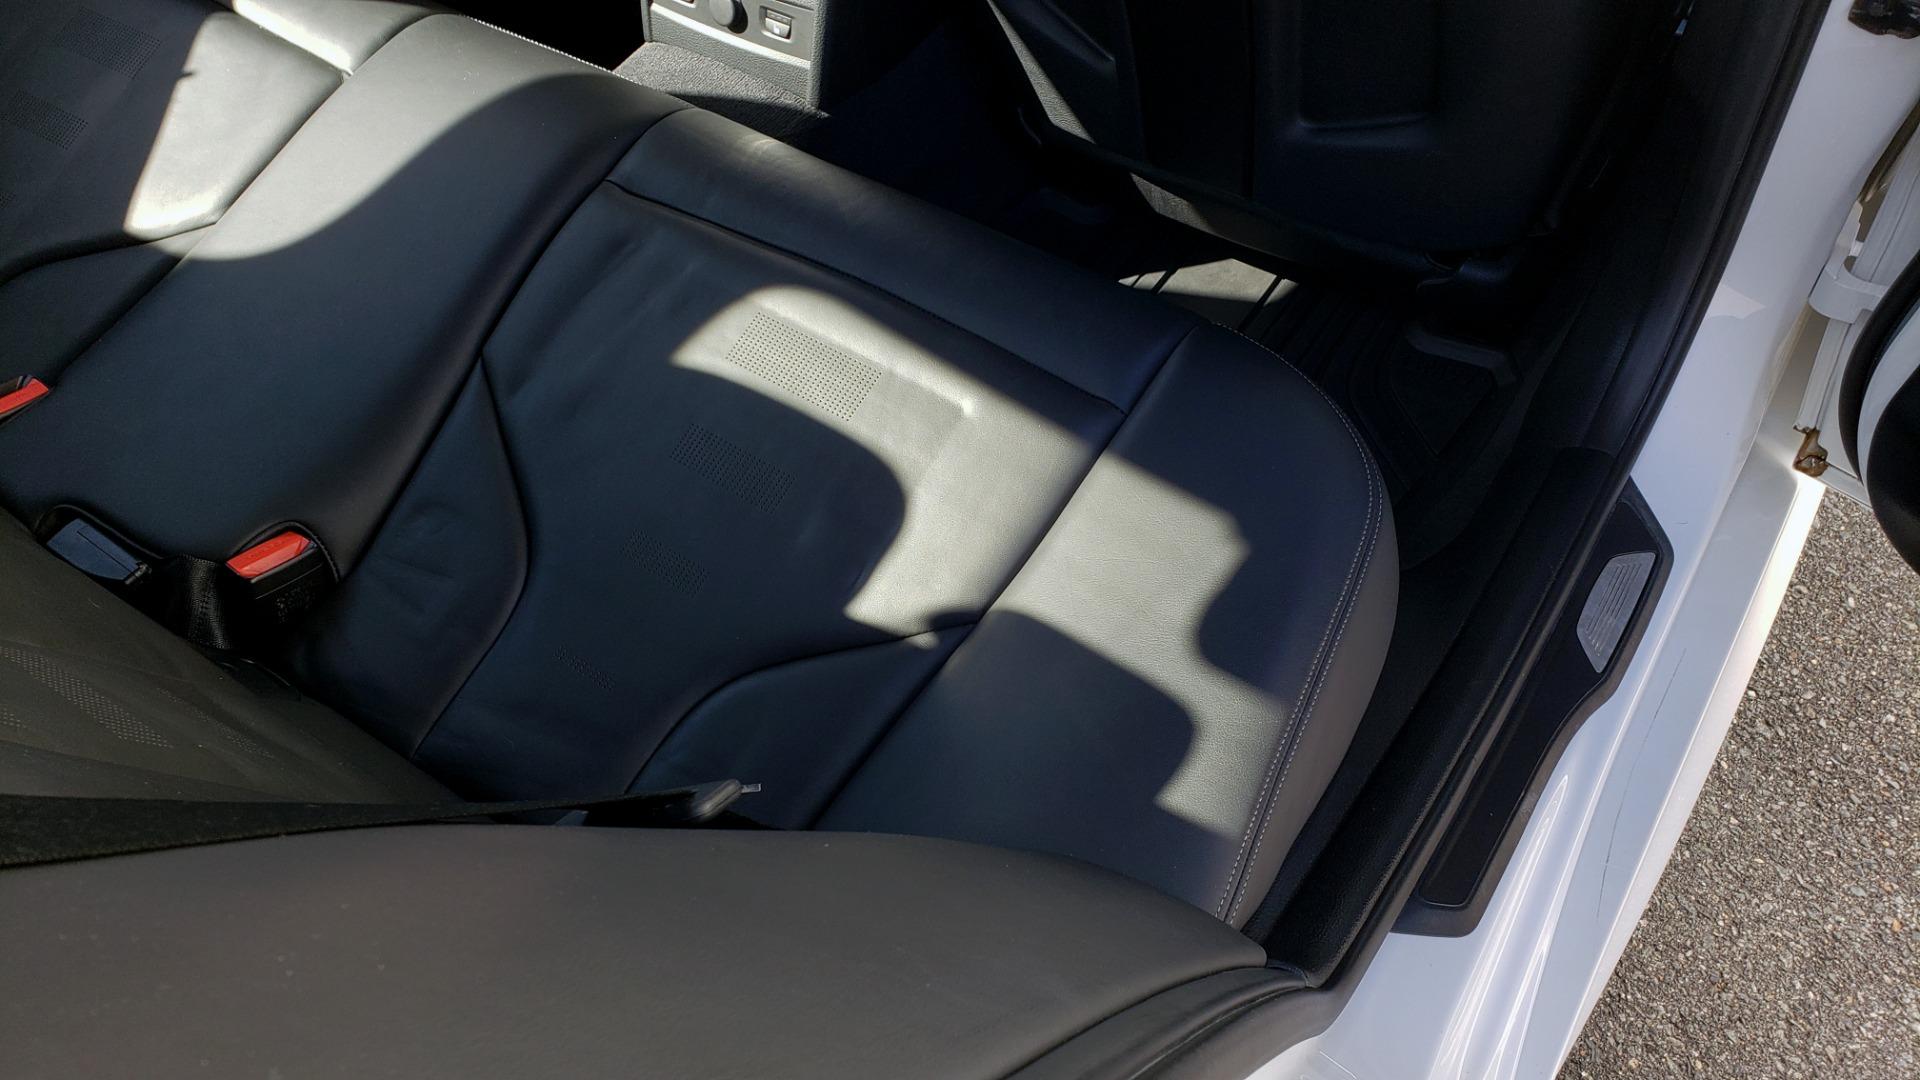 Used 2016 BMW M3 SEDAN / EXECUTIVE PKG / M-SUSPENSION / HARMAN/KARDON SOUND for sale Sold at Formula Imports in Charlotte NC 28227 73